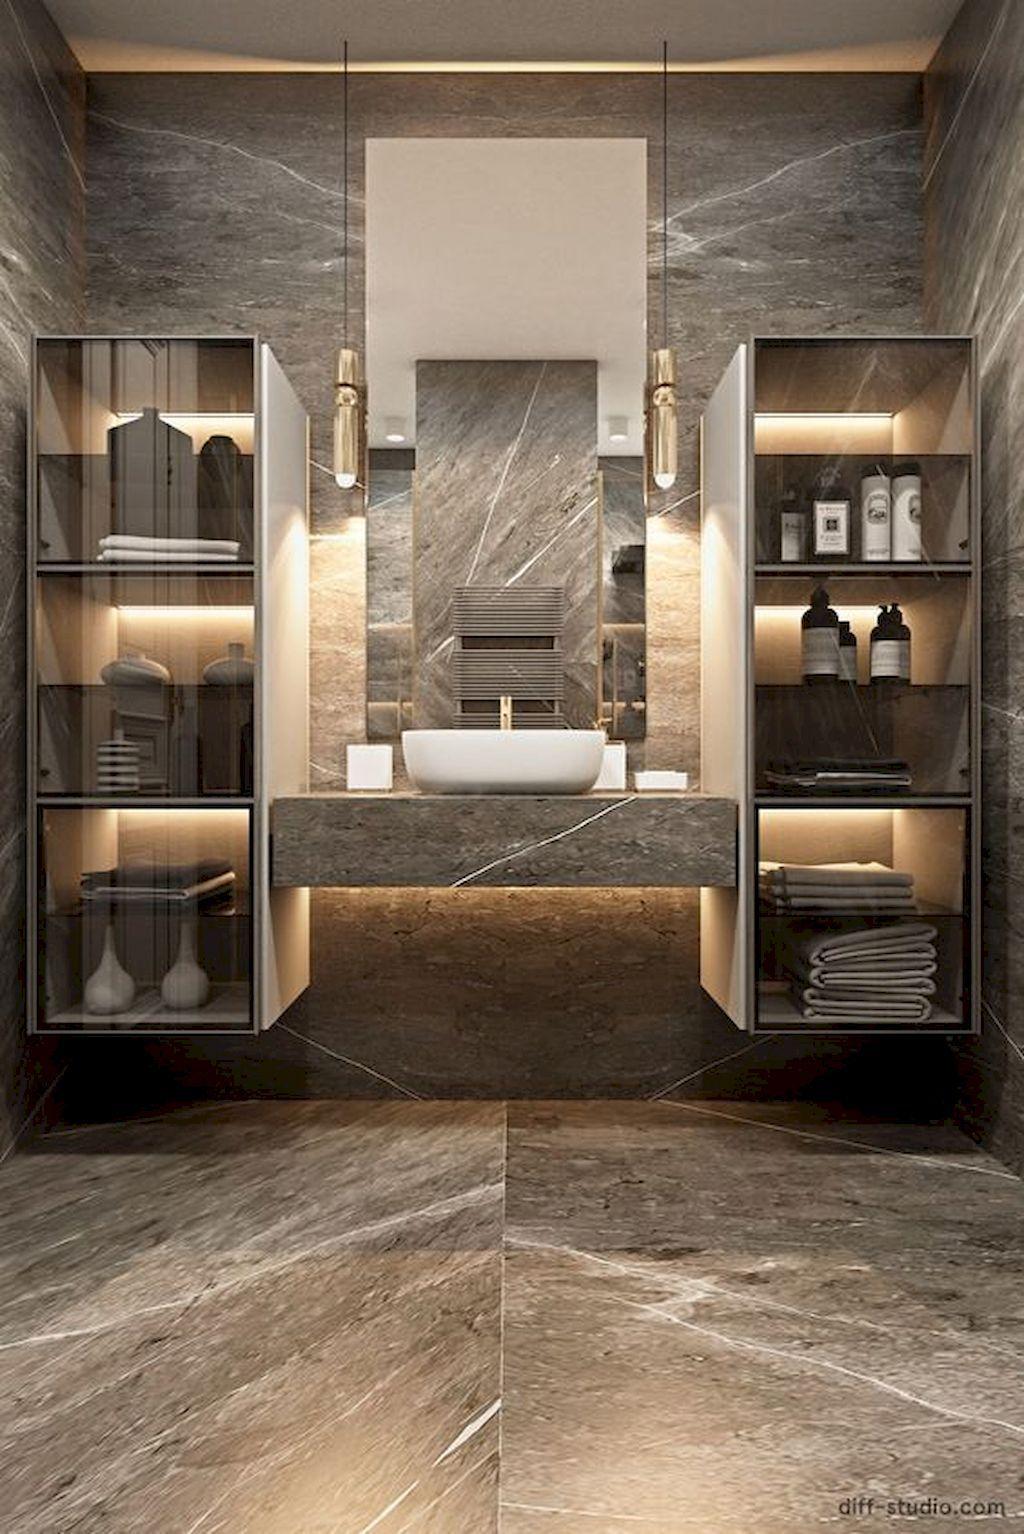 Modern Bathroom Design Salle De Bains Moderne Idee Salle De Bain